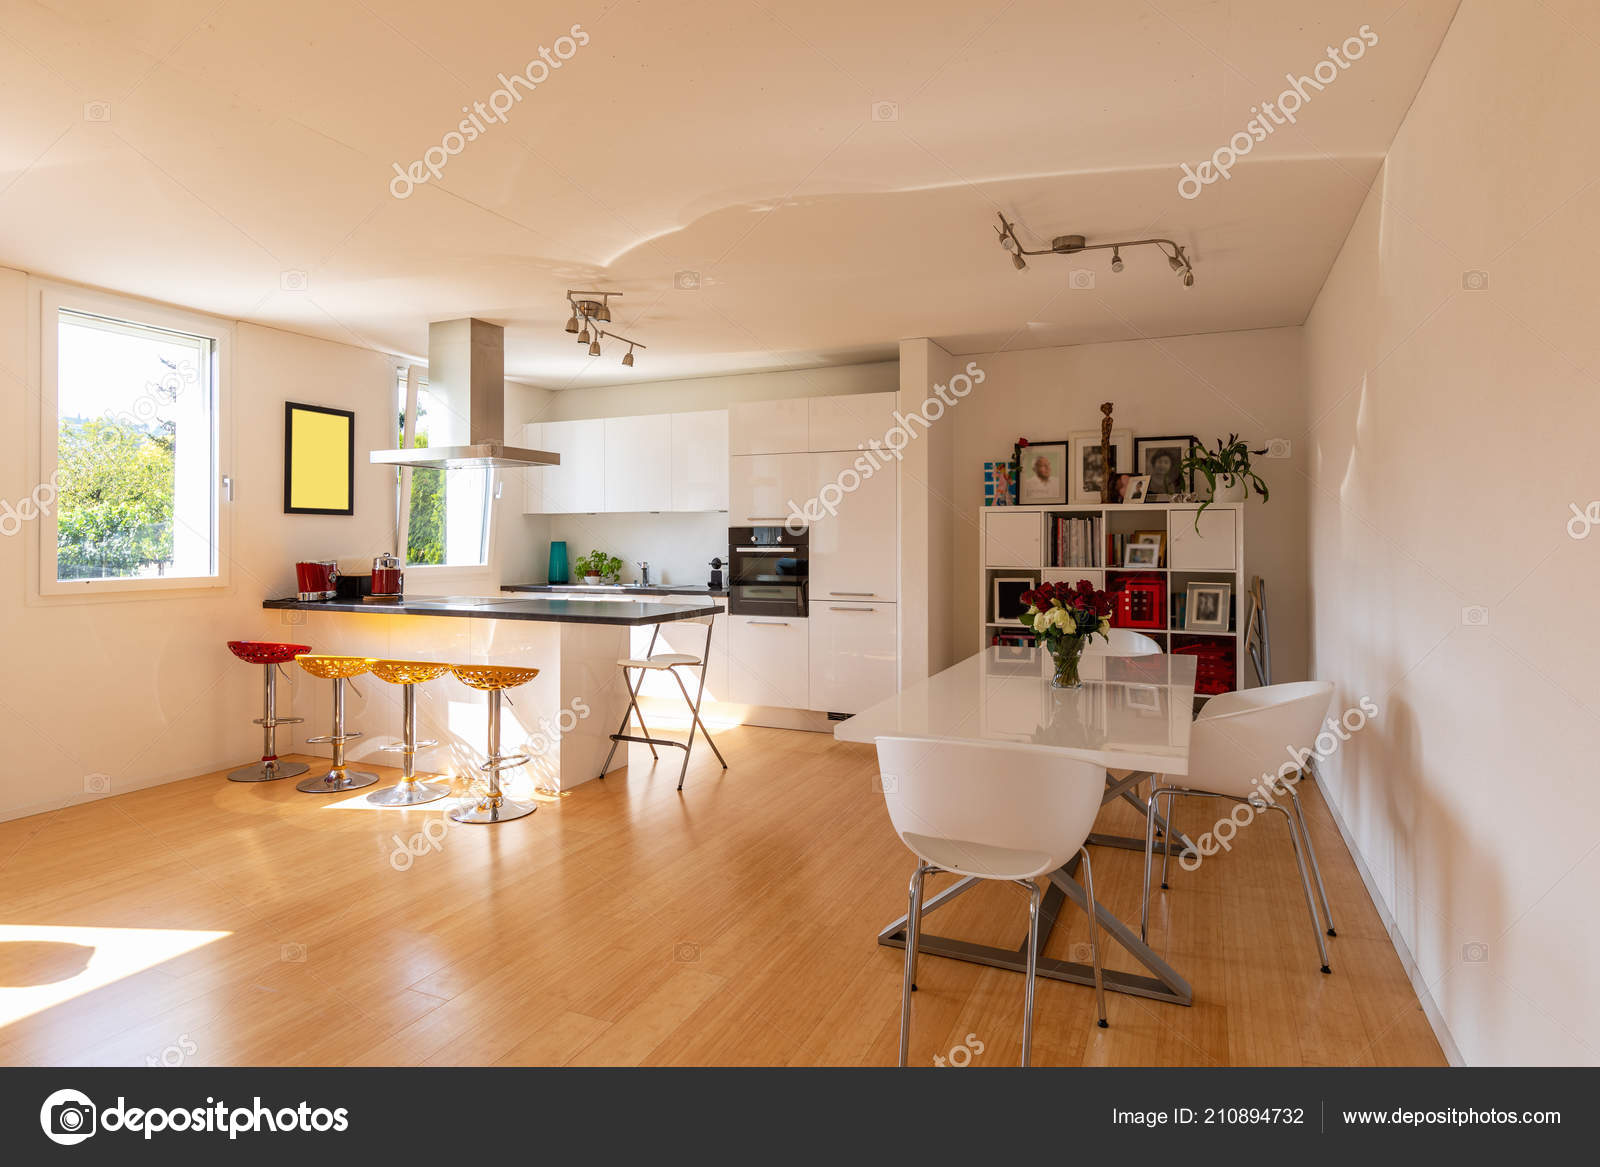 Cocina Apartamento Moderno Con Sala Comedor Diseño Nadie Dentro ...